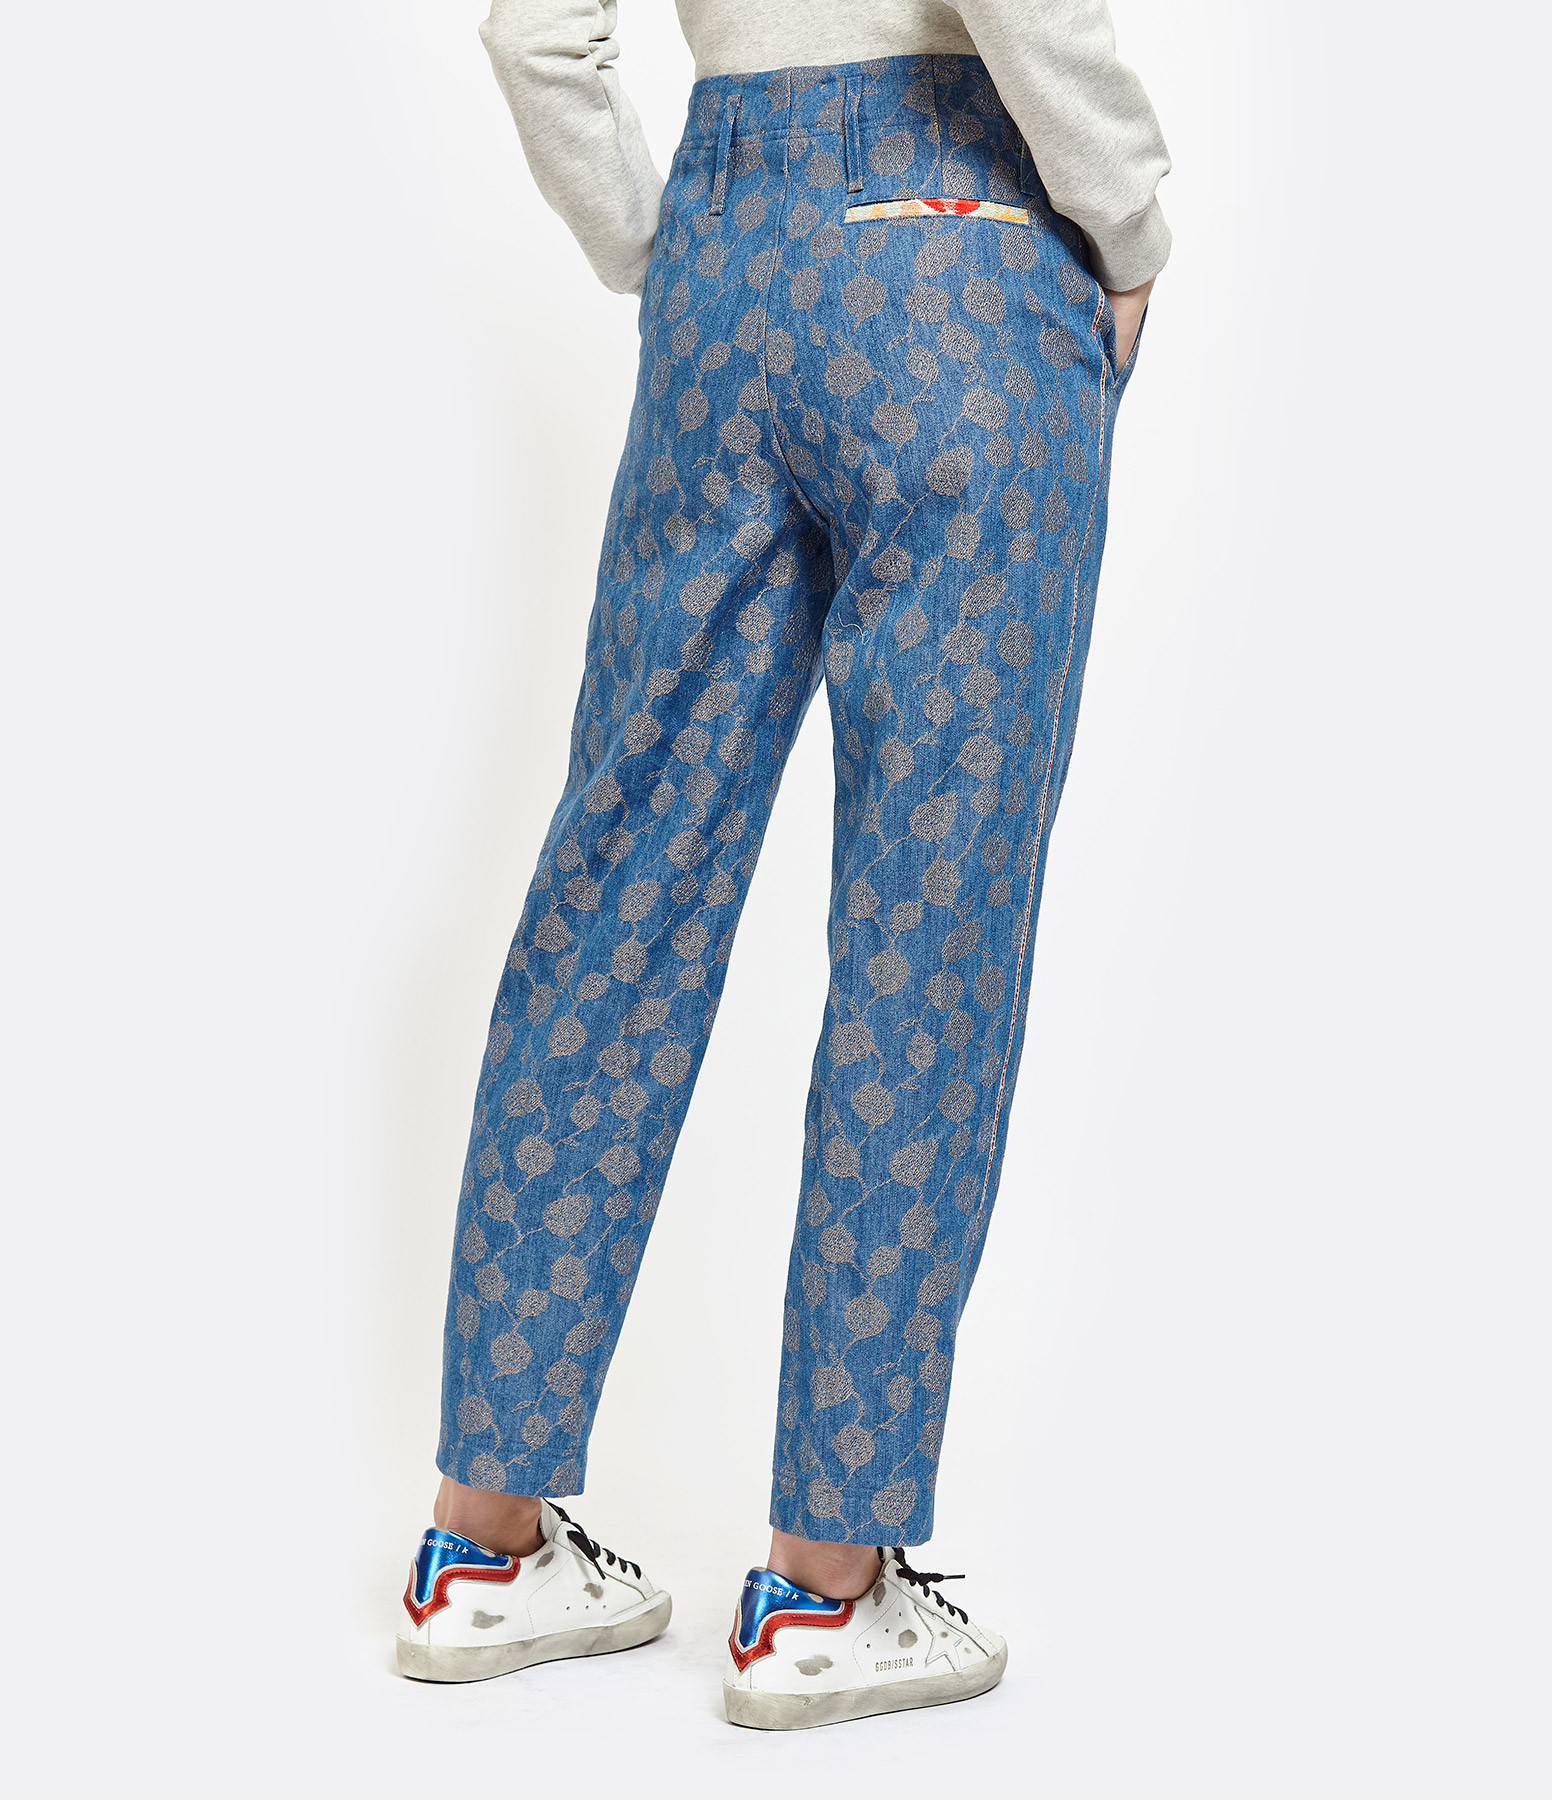 FORTE_FORTE - Pantalon Chachacha Jaquard Indigo